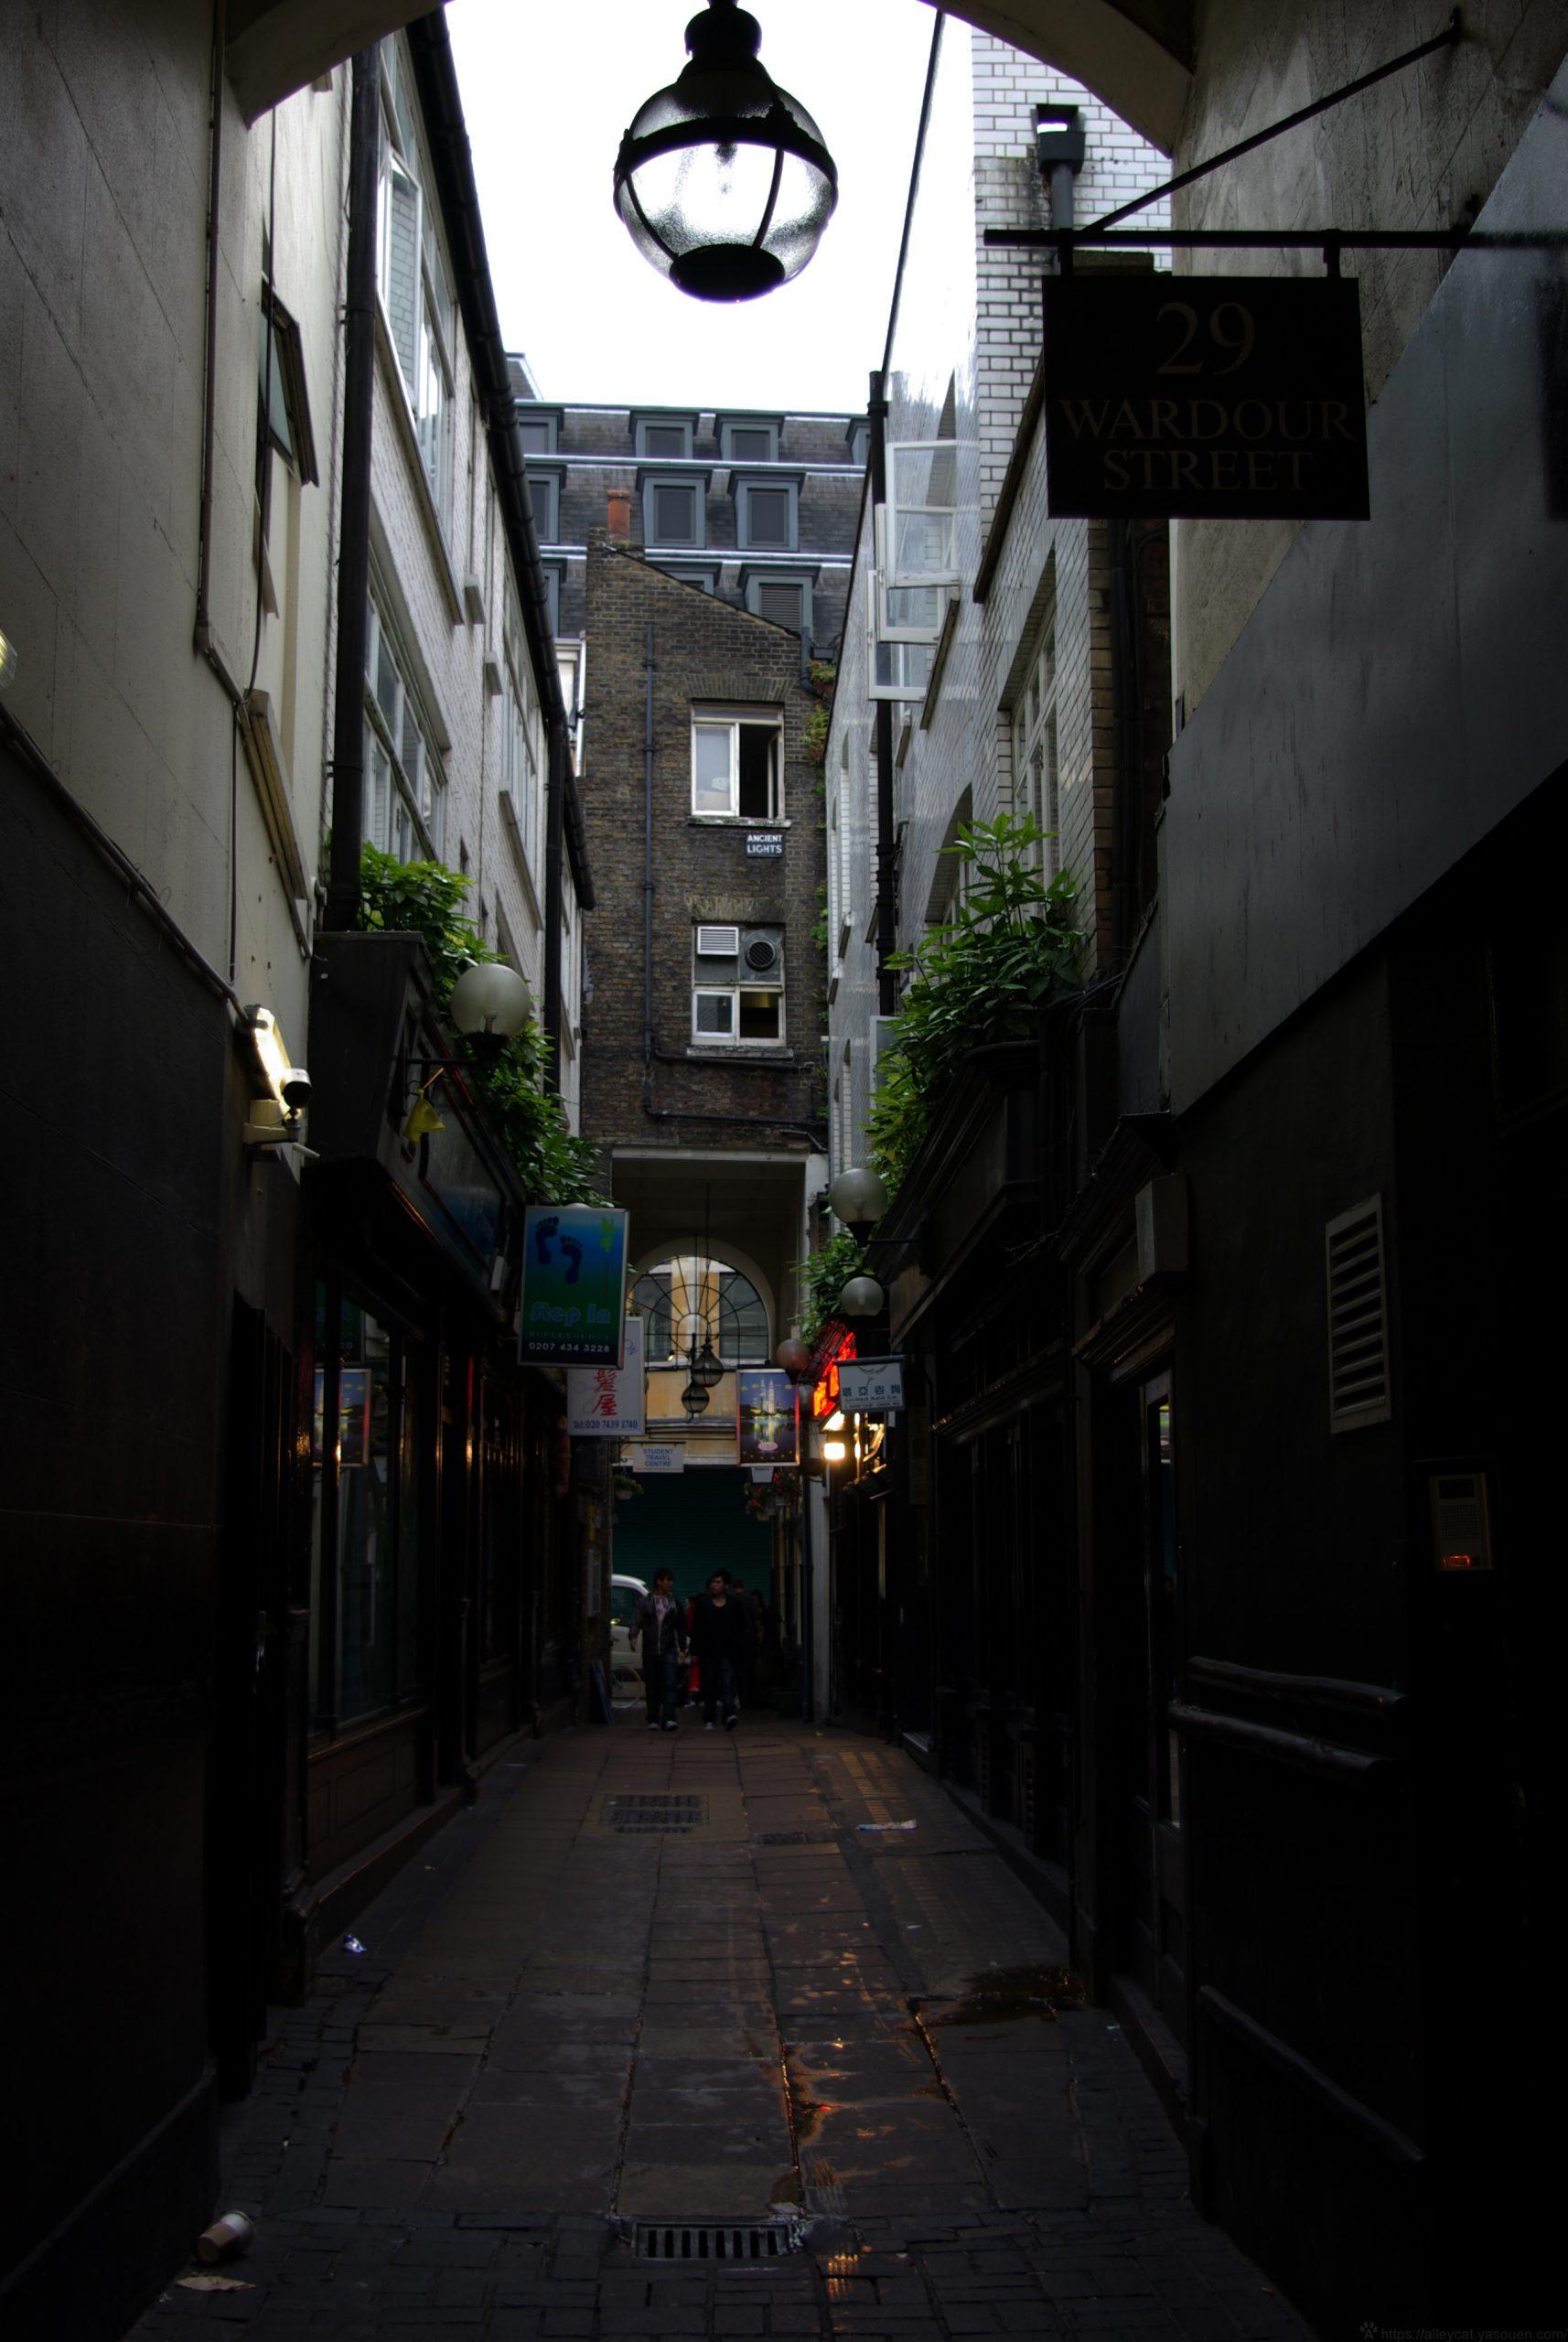 London, UK, 2009